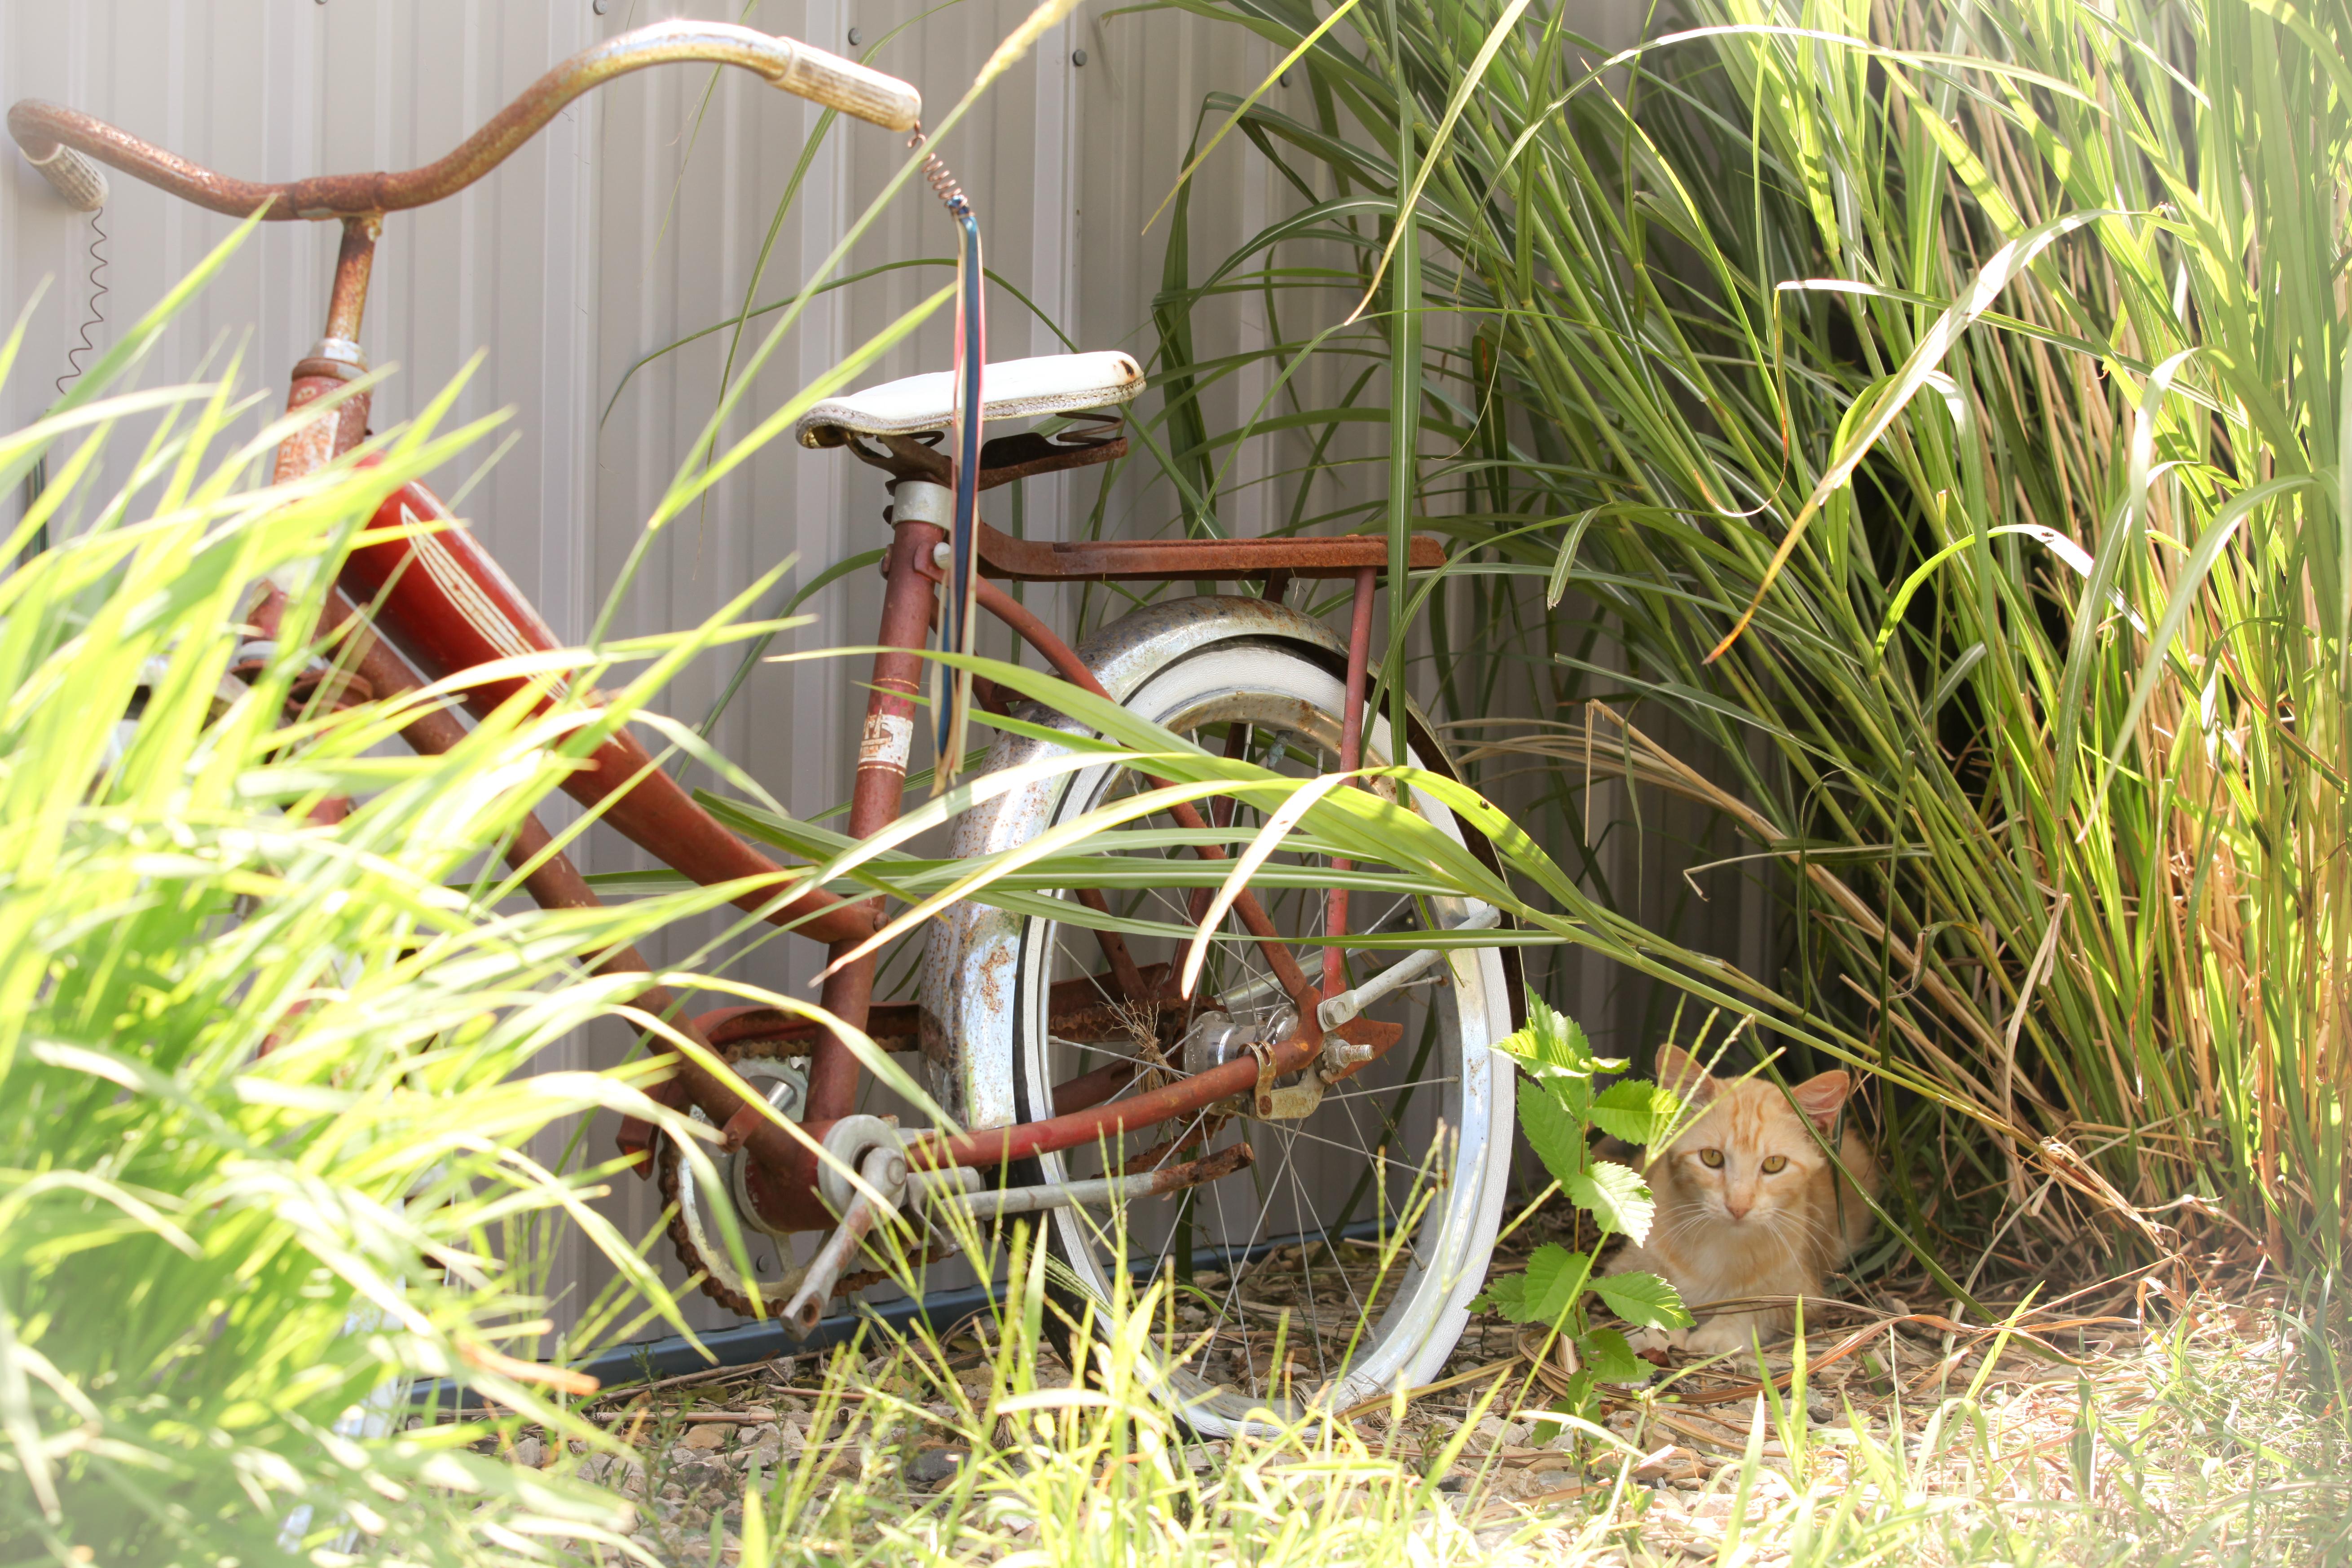 Cats-5139